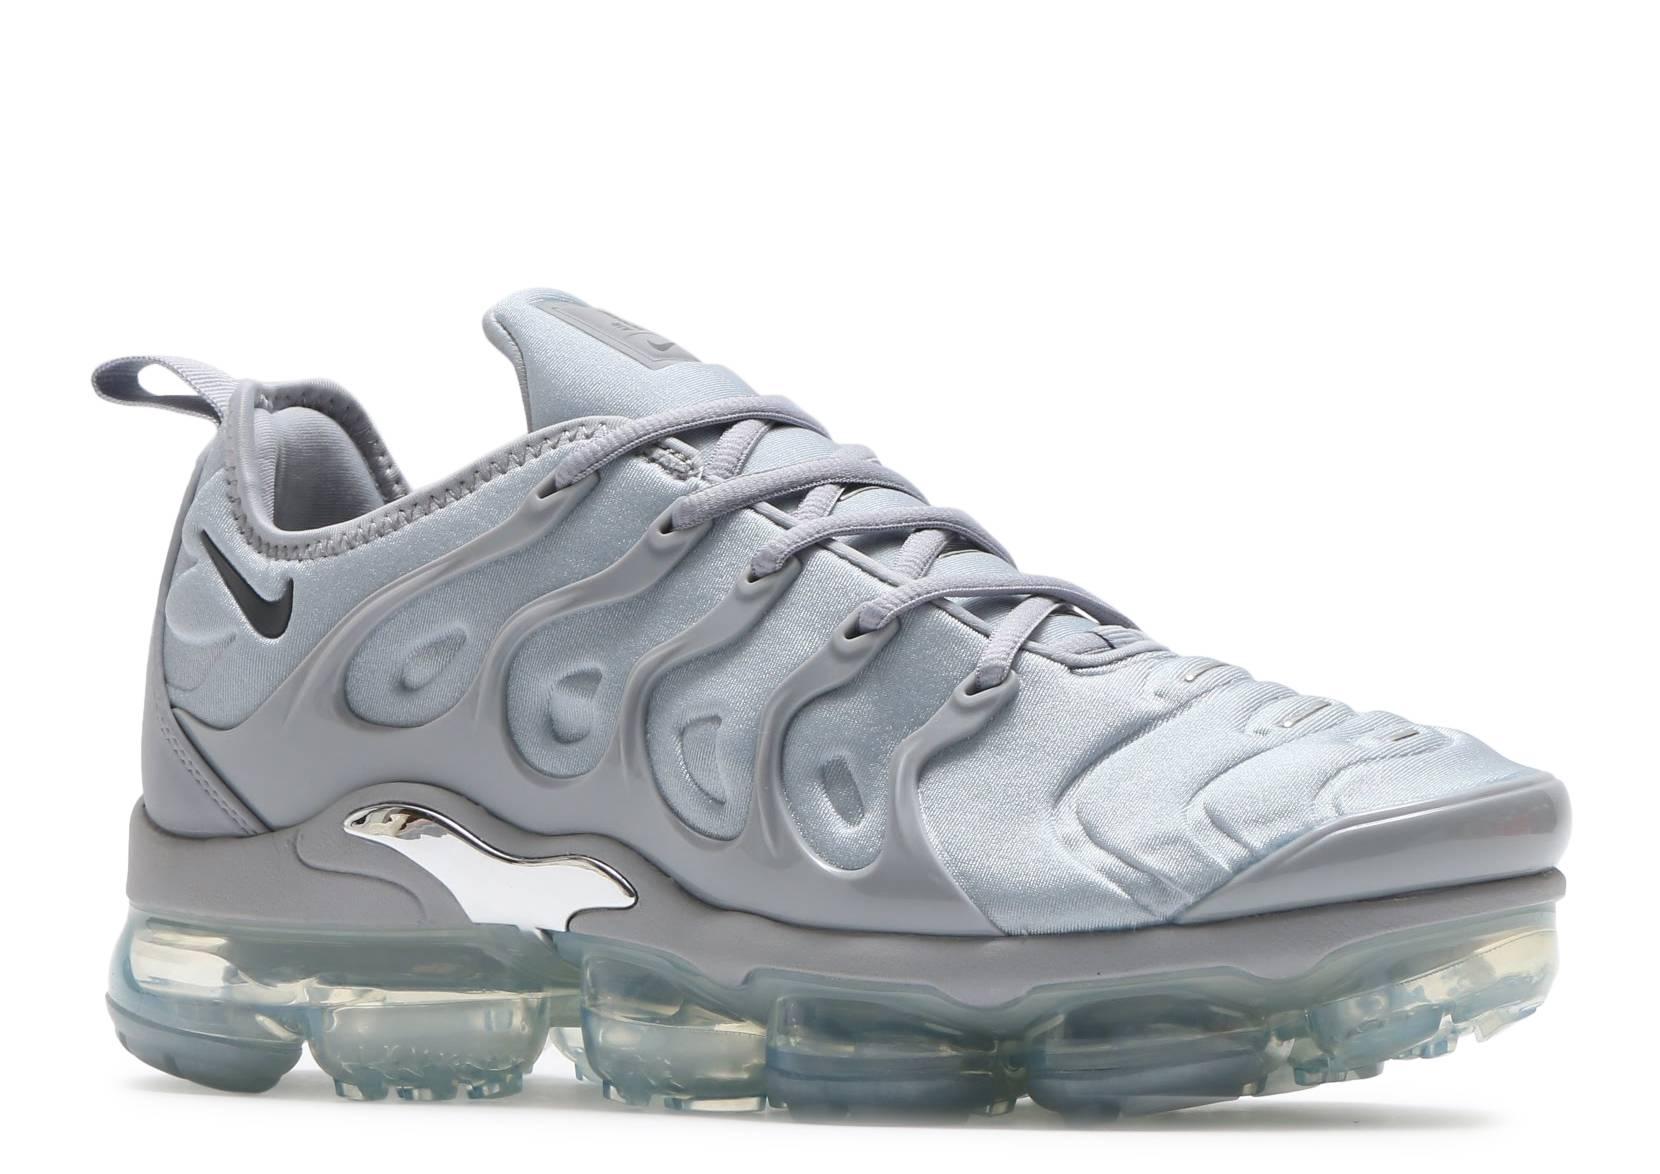 6d323507b8cd AIR VAPORMAX PLUS - Nike - 924453 005 - wolf grey dark grey-metallic silver